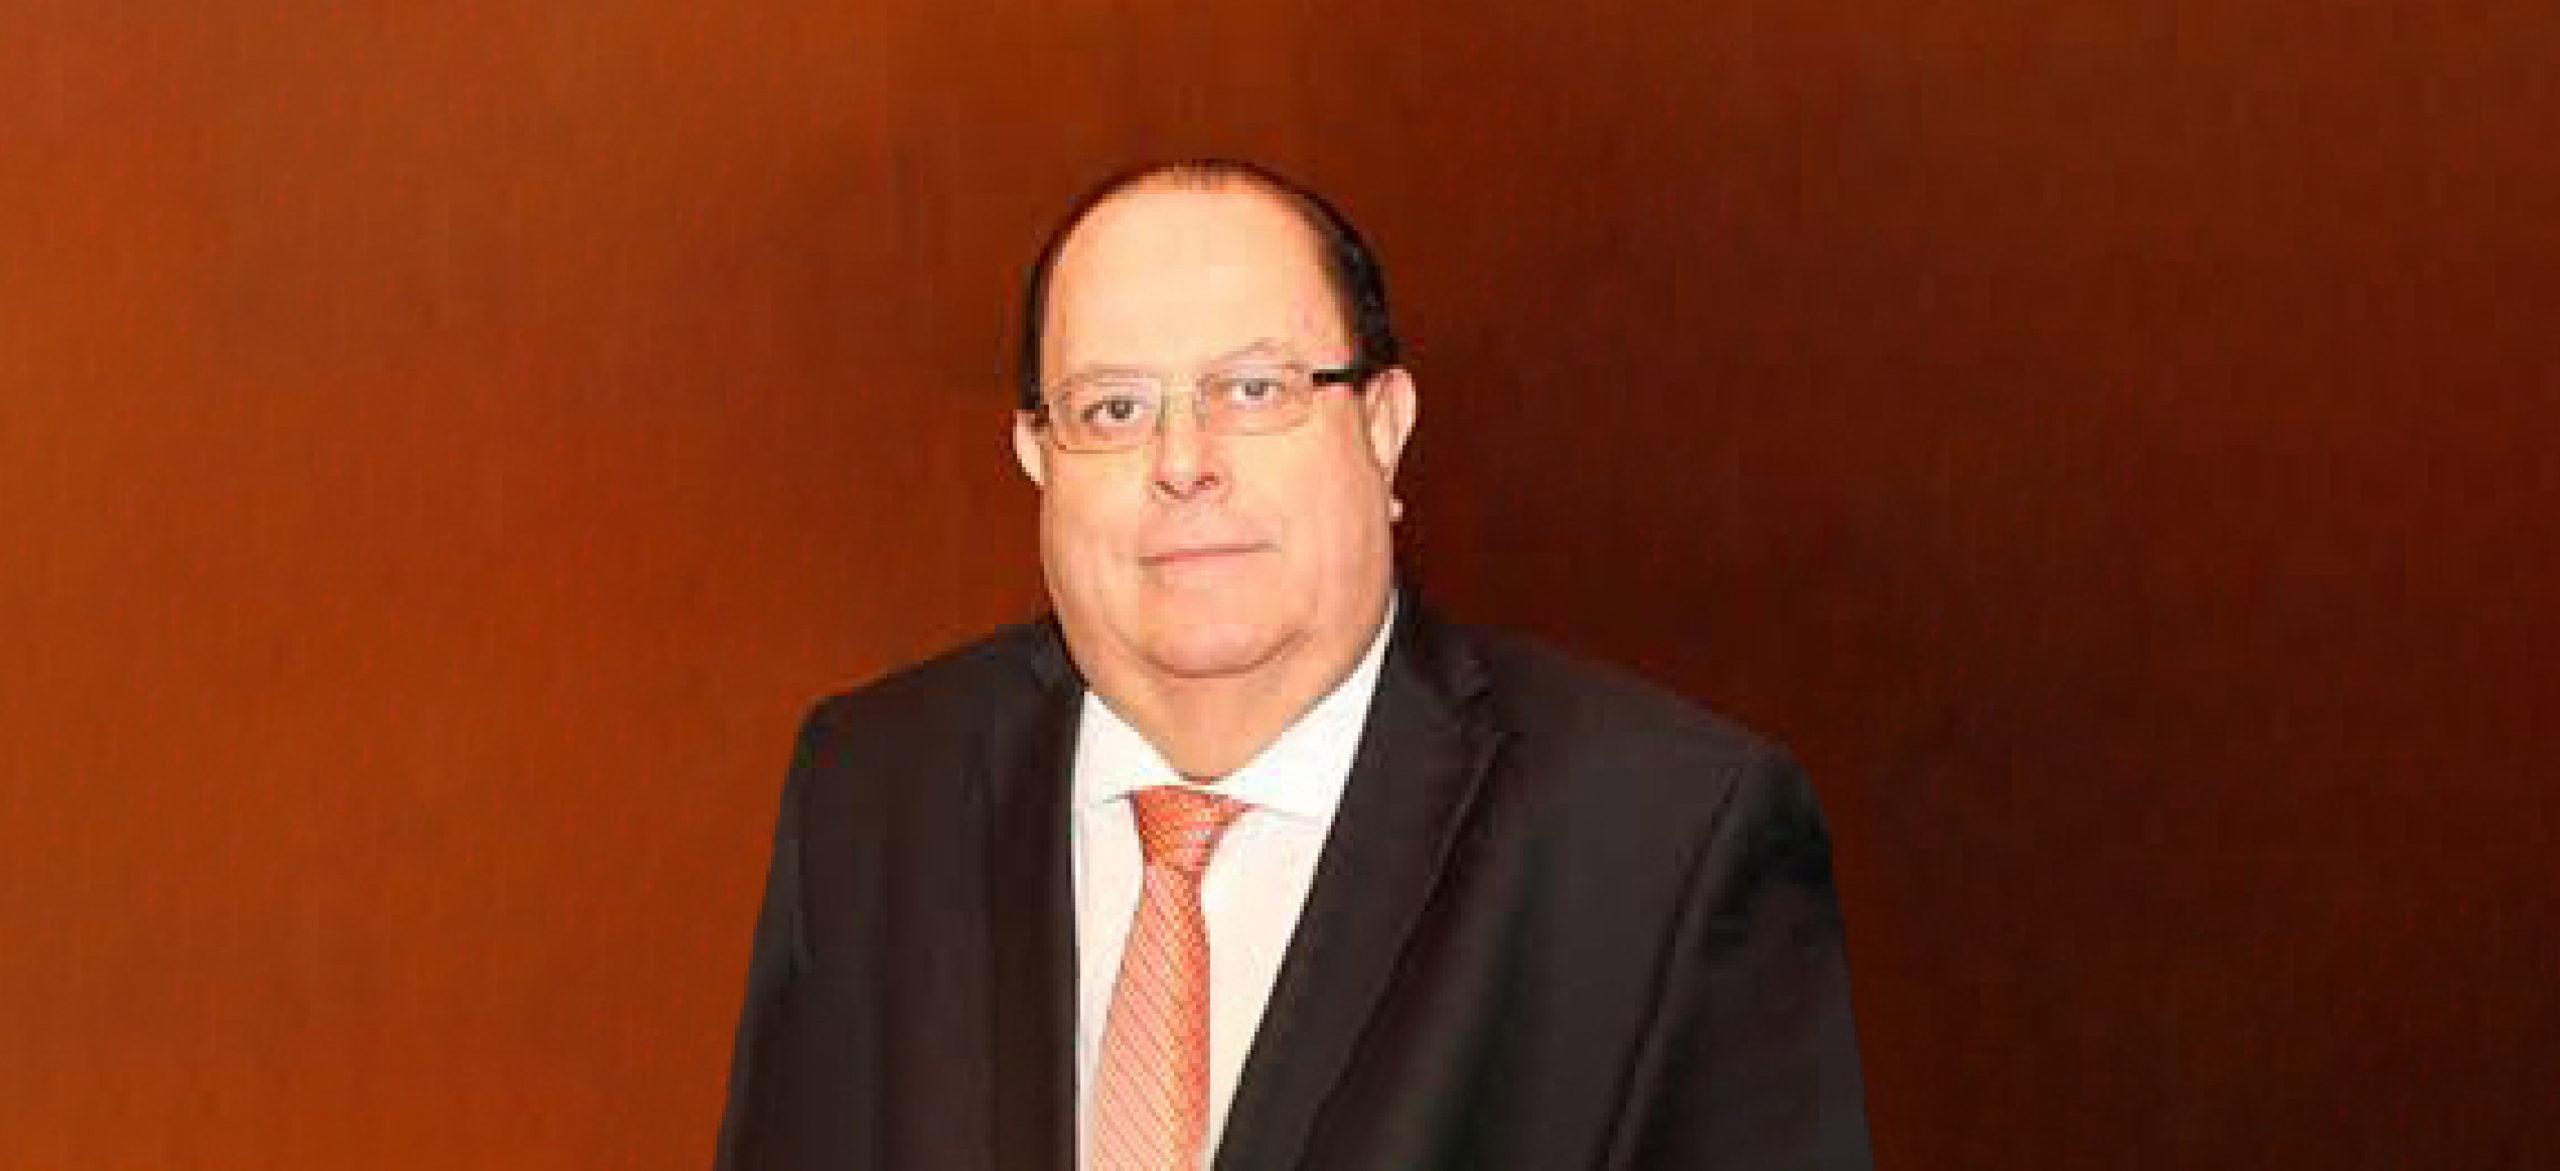 Julio Velarde BCRP Perumin